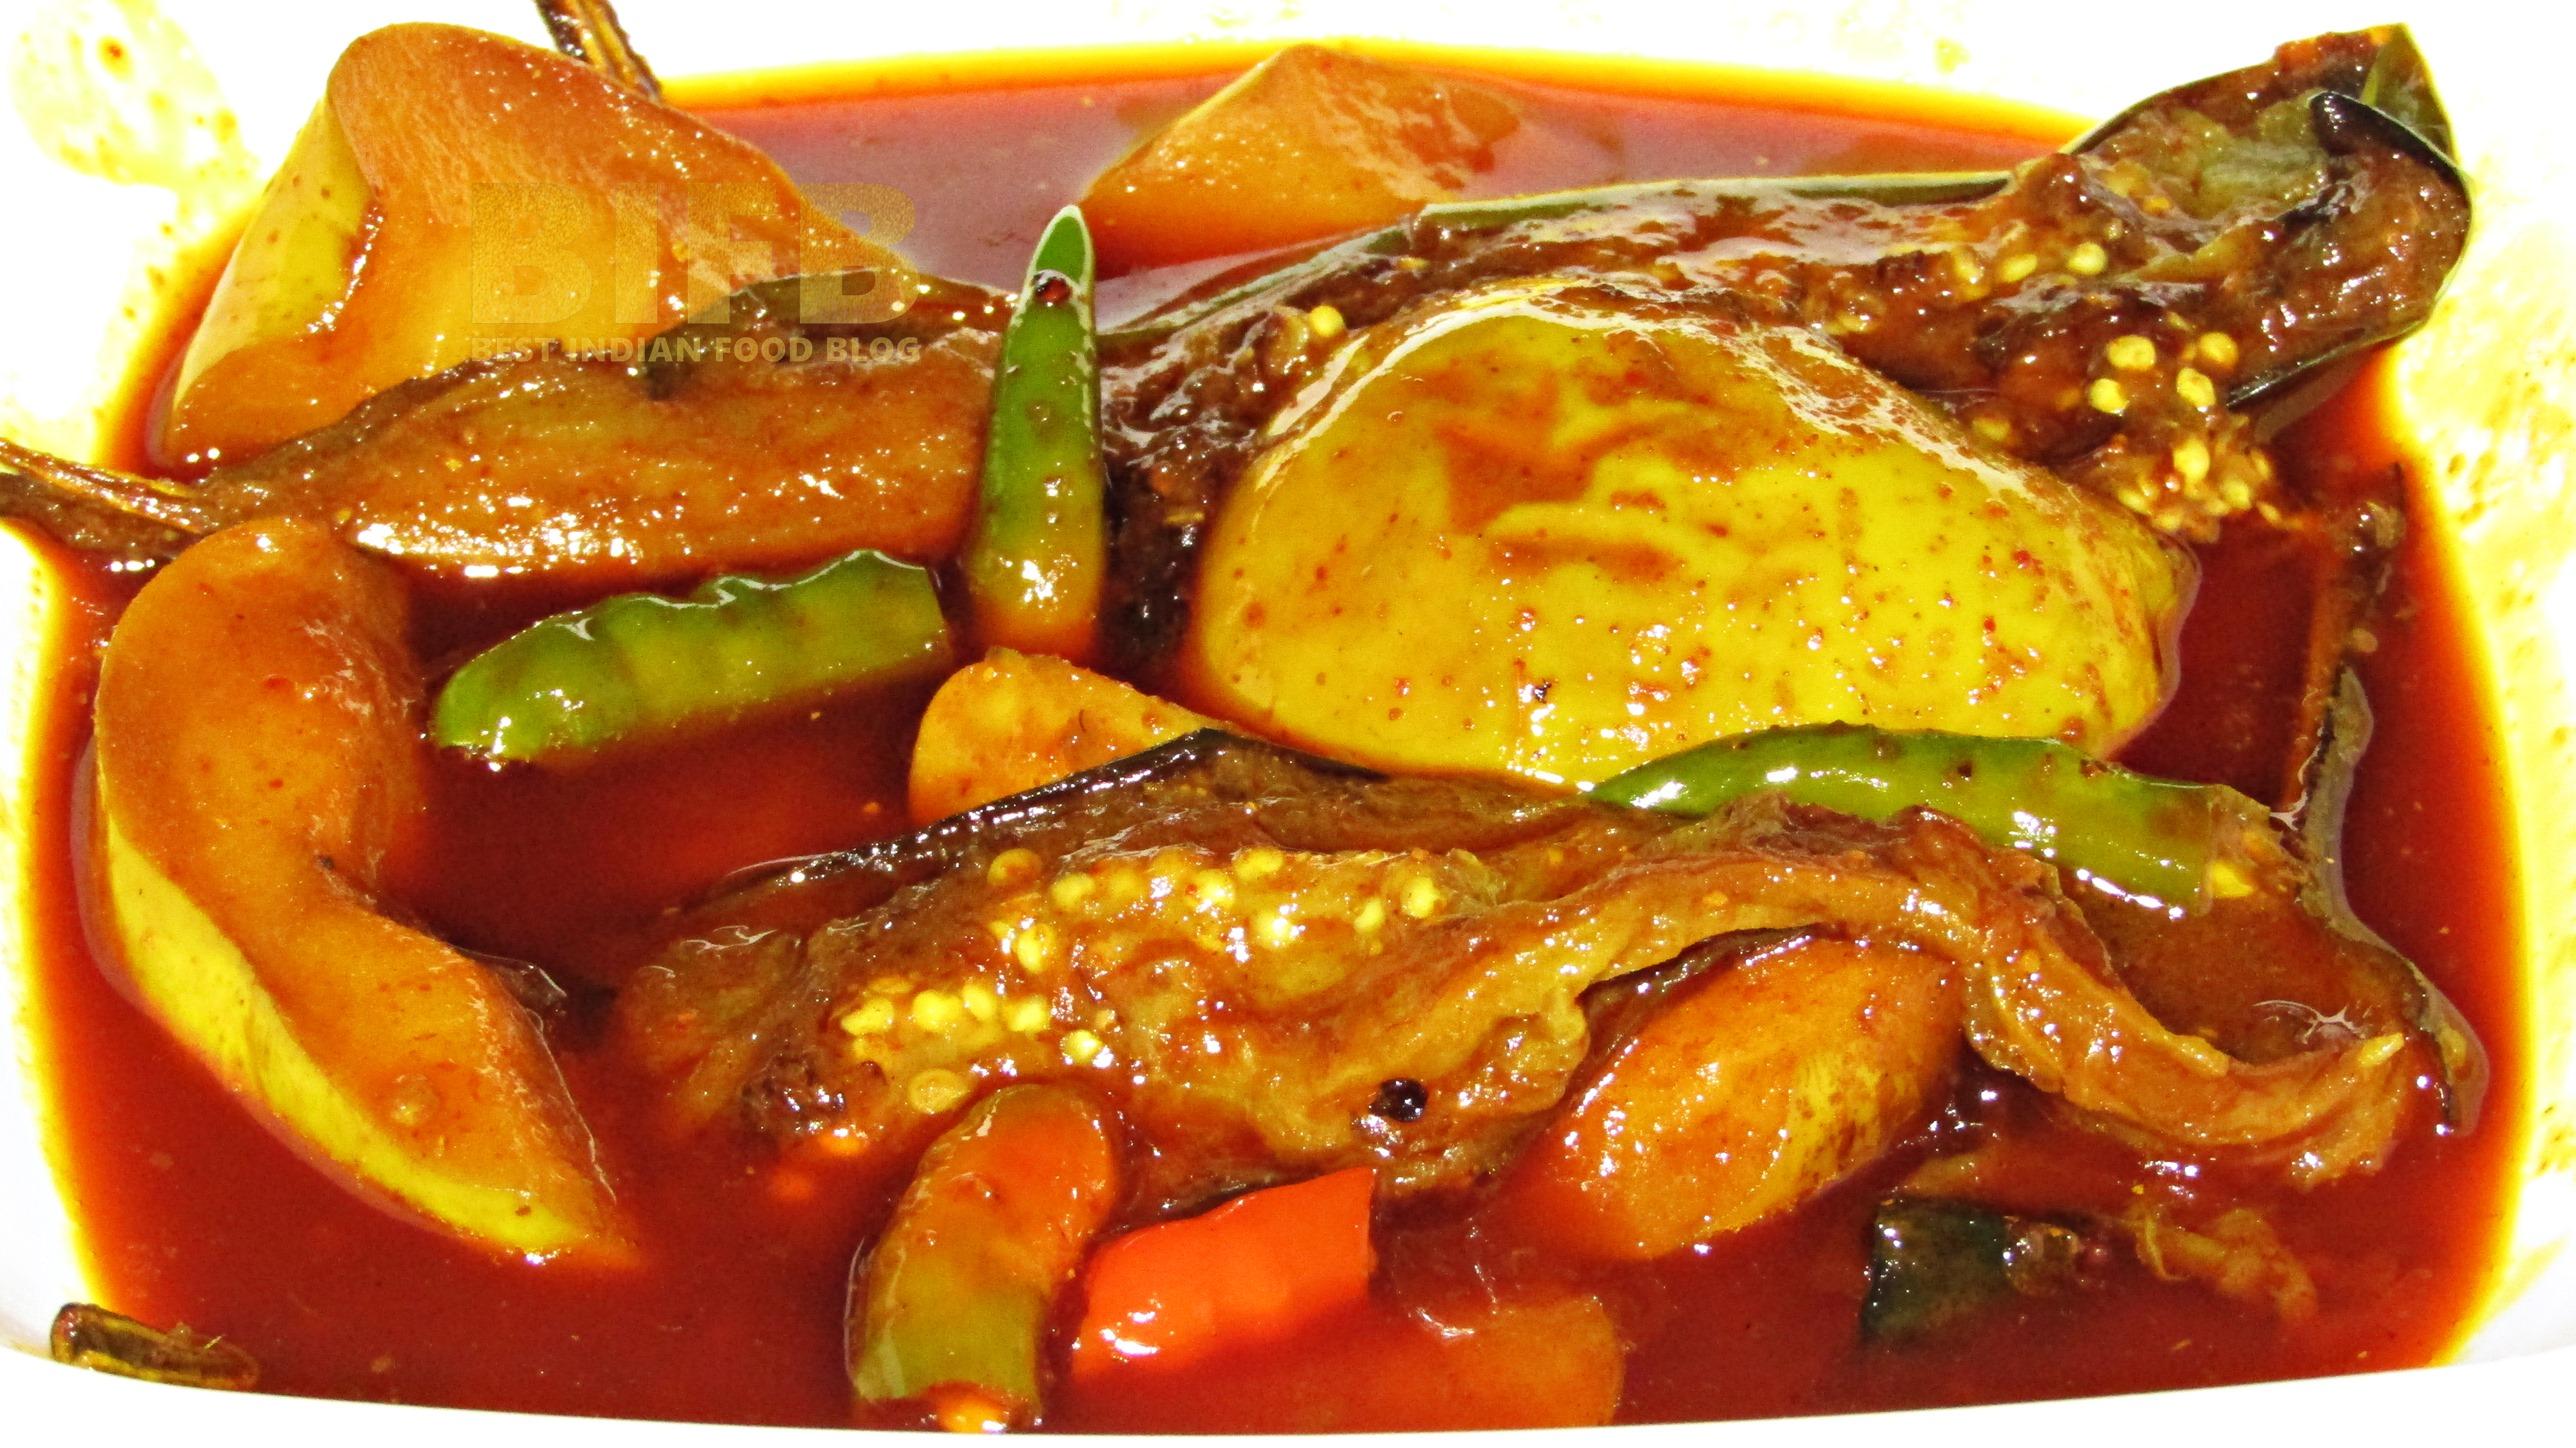 Tchoonth Wangun from Jammu and Kashmir, India   Best Indian Food Blog   Aubergine Apple recipe